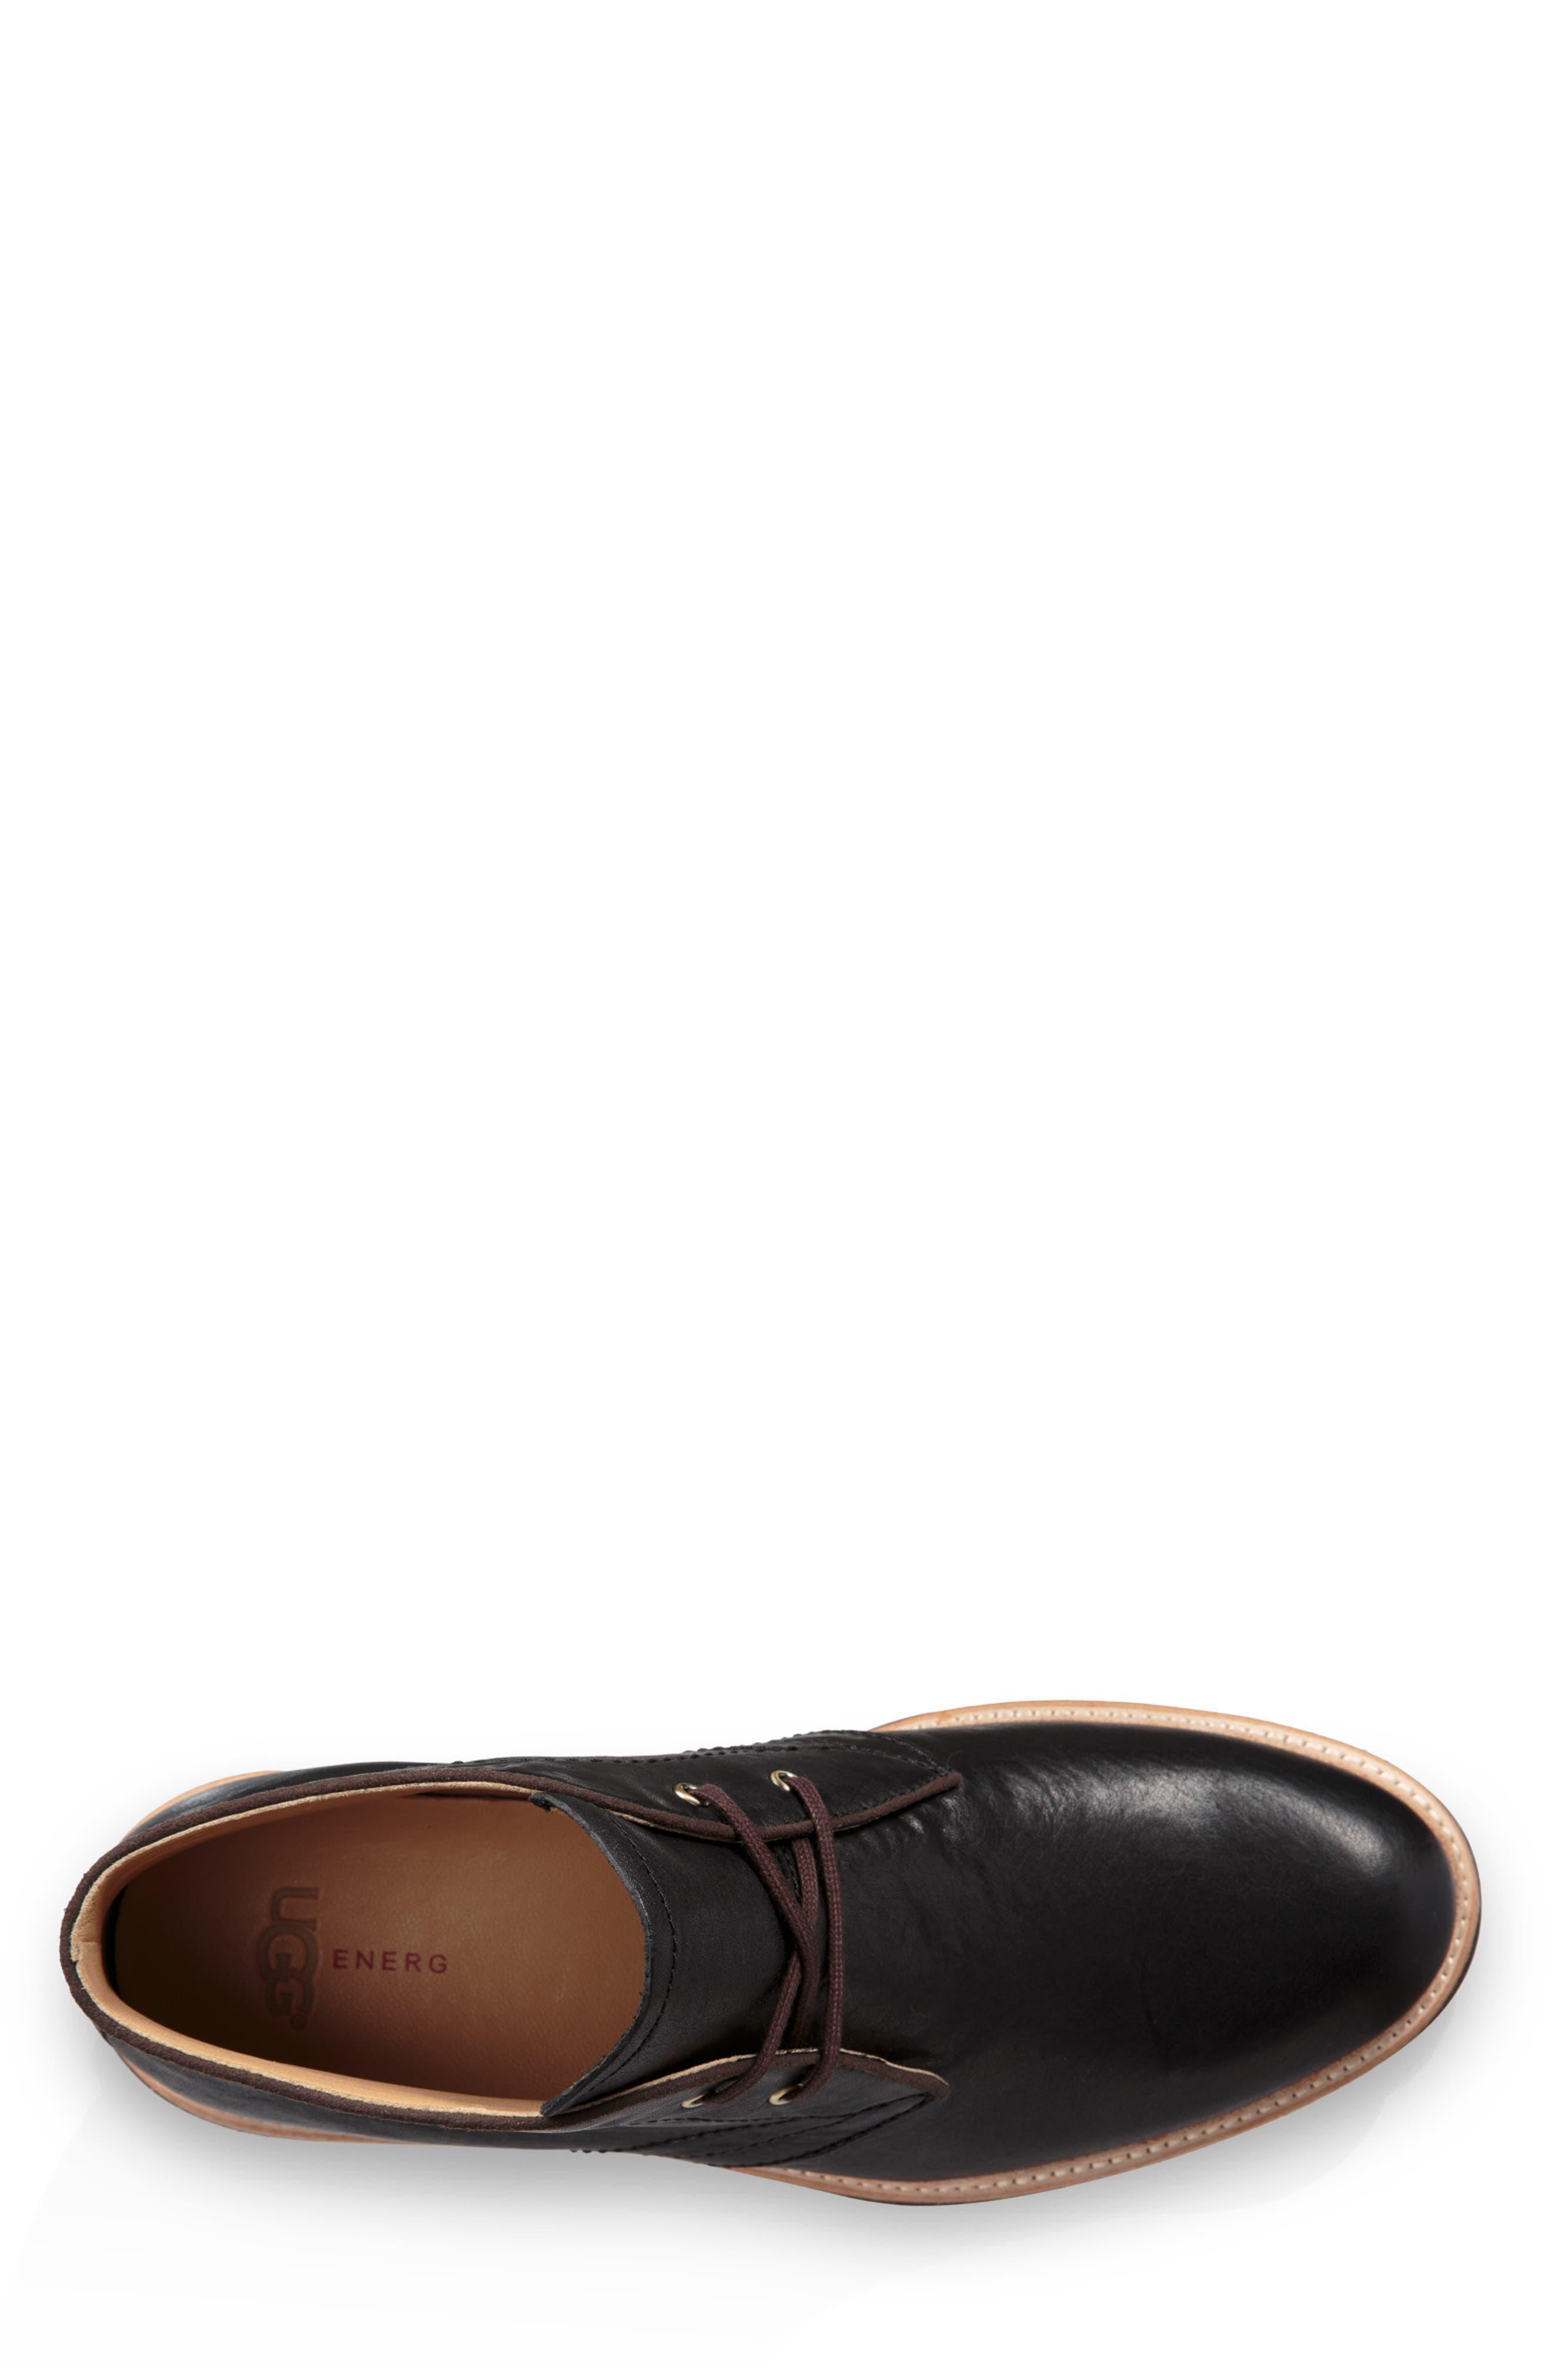 Australia Dagmann Chukka Boot,                             Alternate thumbnail 4, color,                             BLACK LEATHER/SUEDE